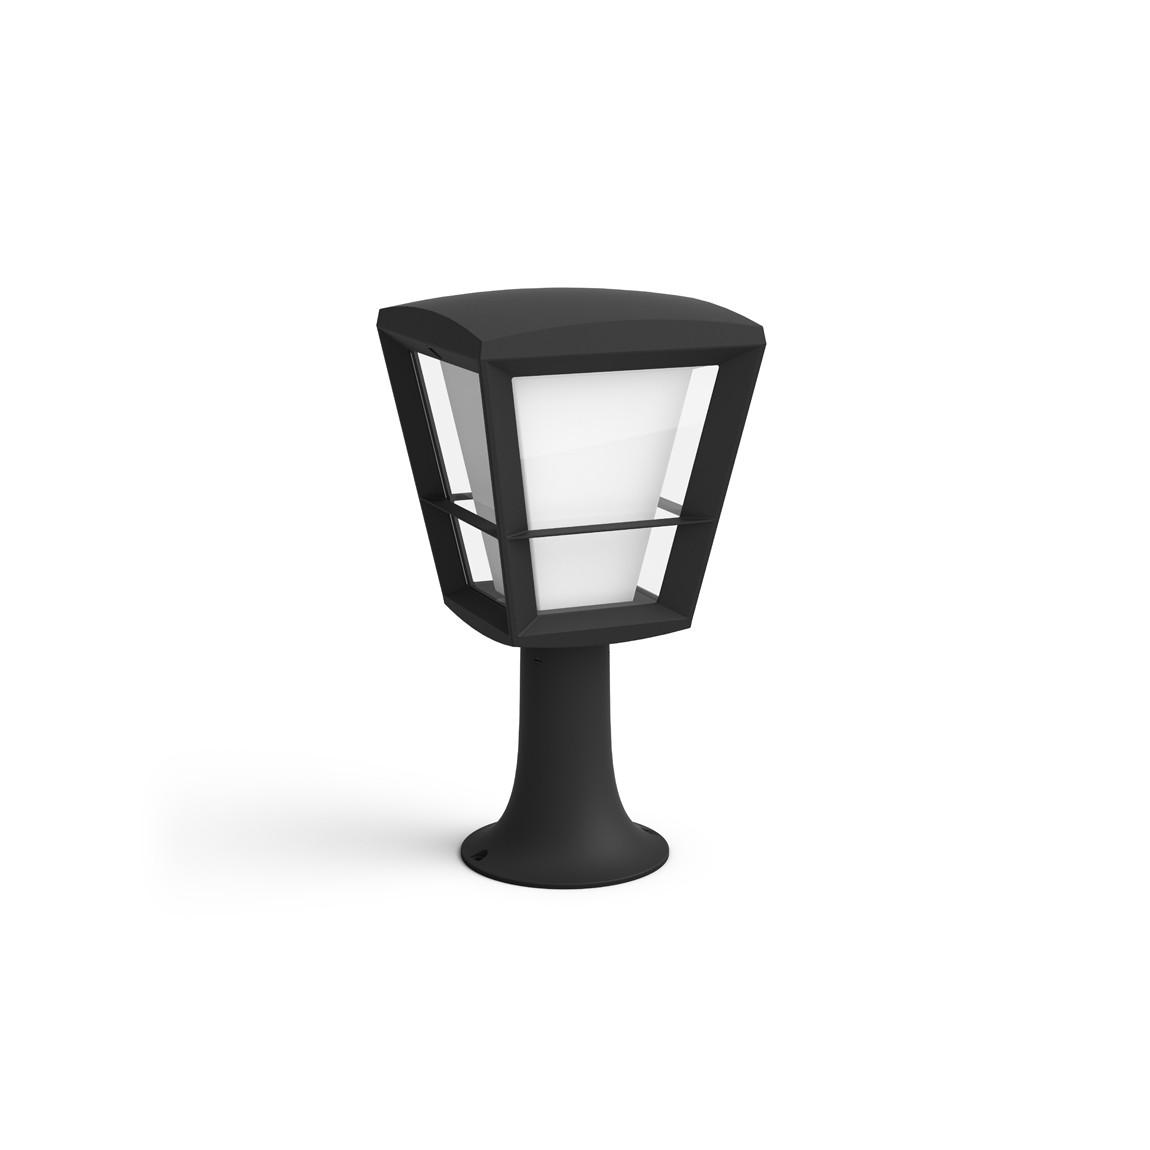 Philips Hue LED Sockelleuchte Econic - Schwarz